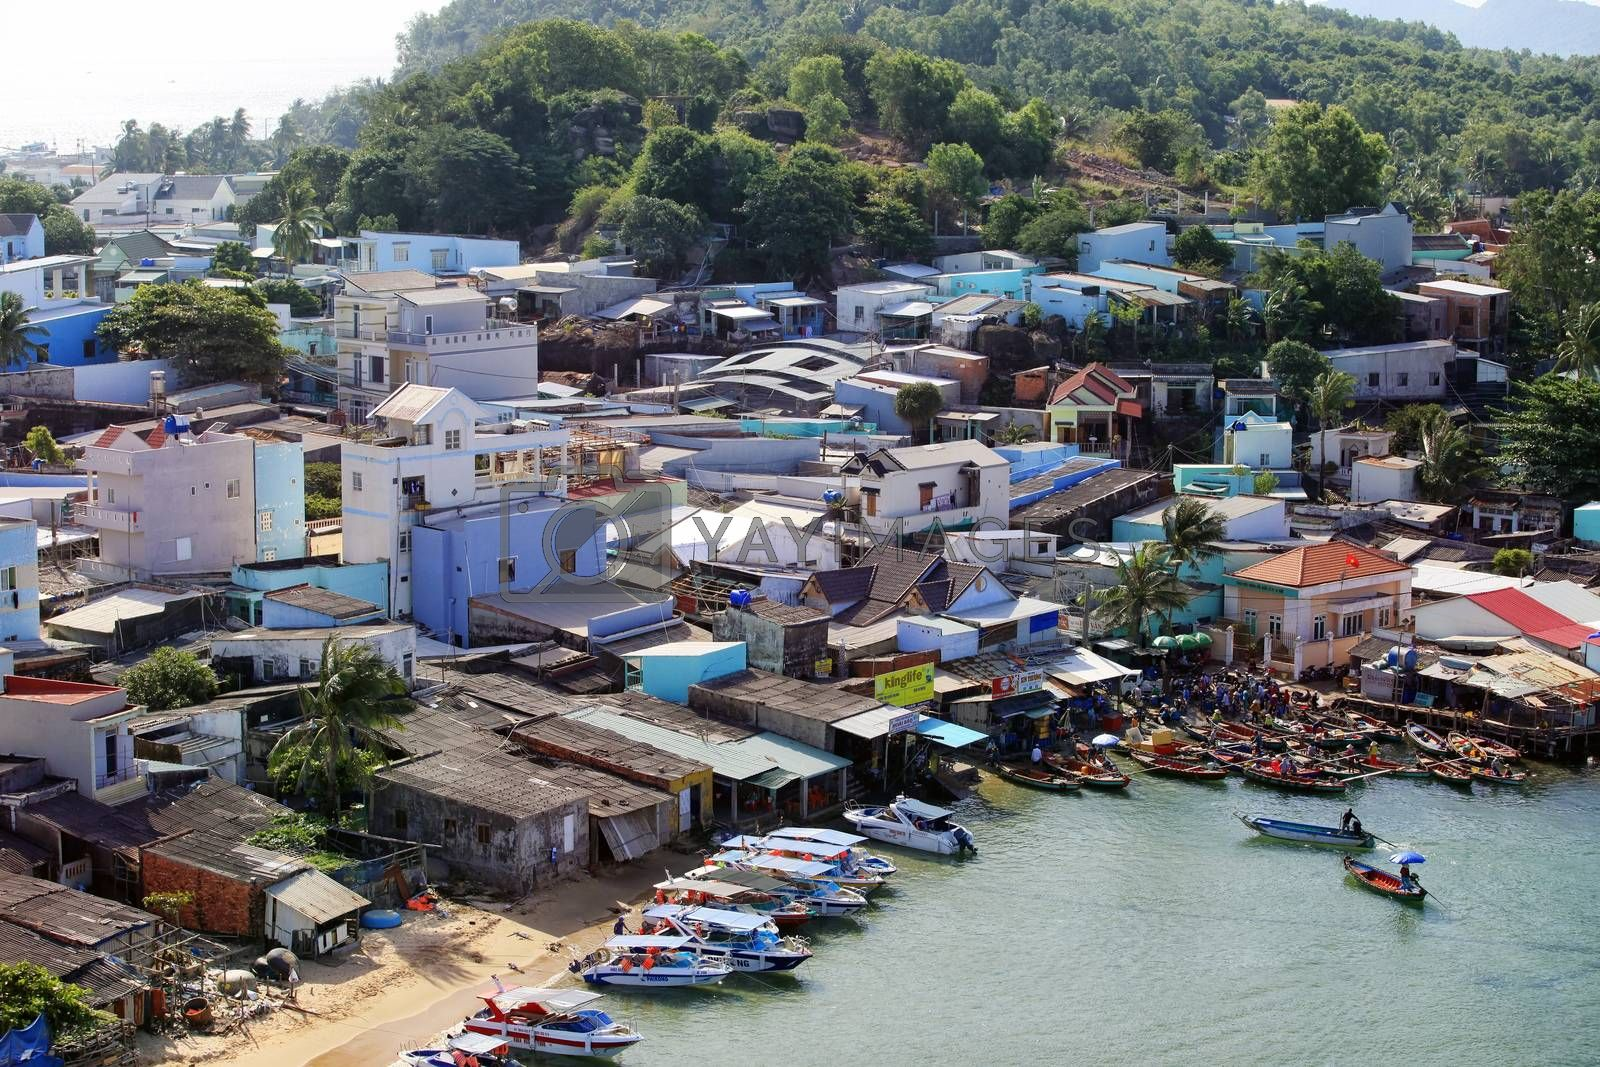 Fishing village top view in Vietnam, Phu Quoc